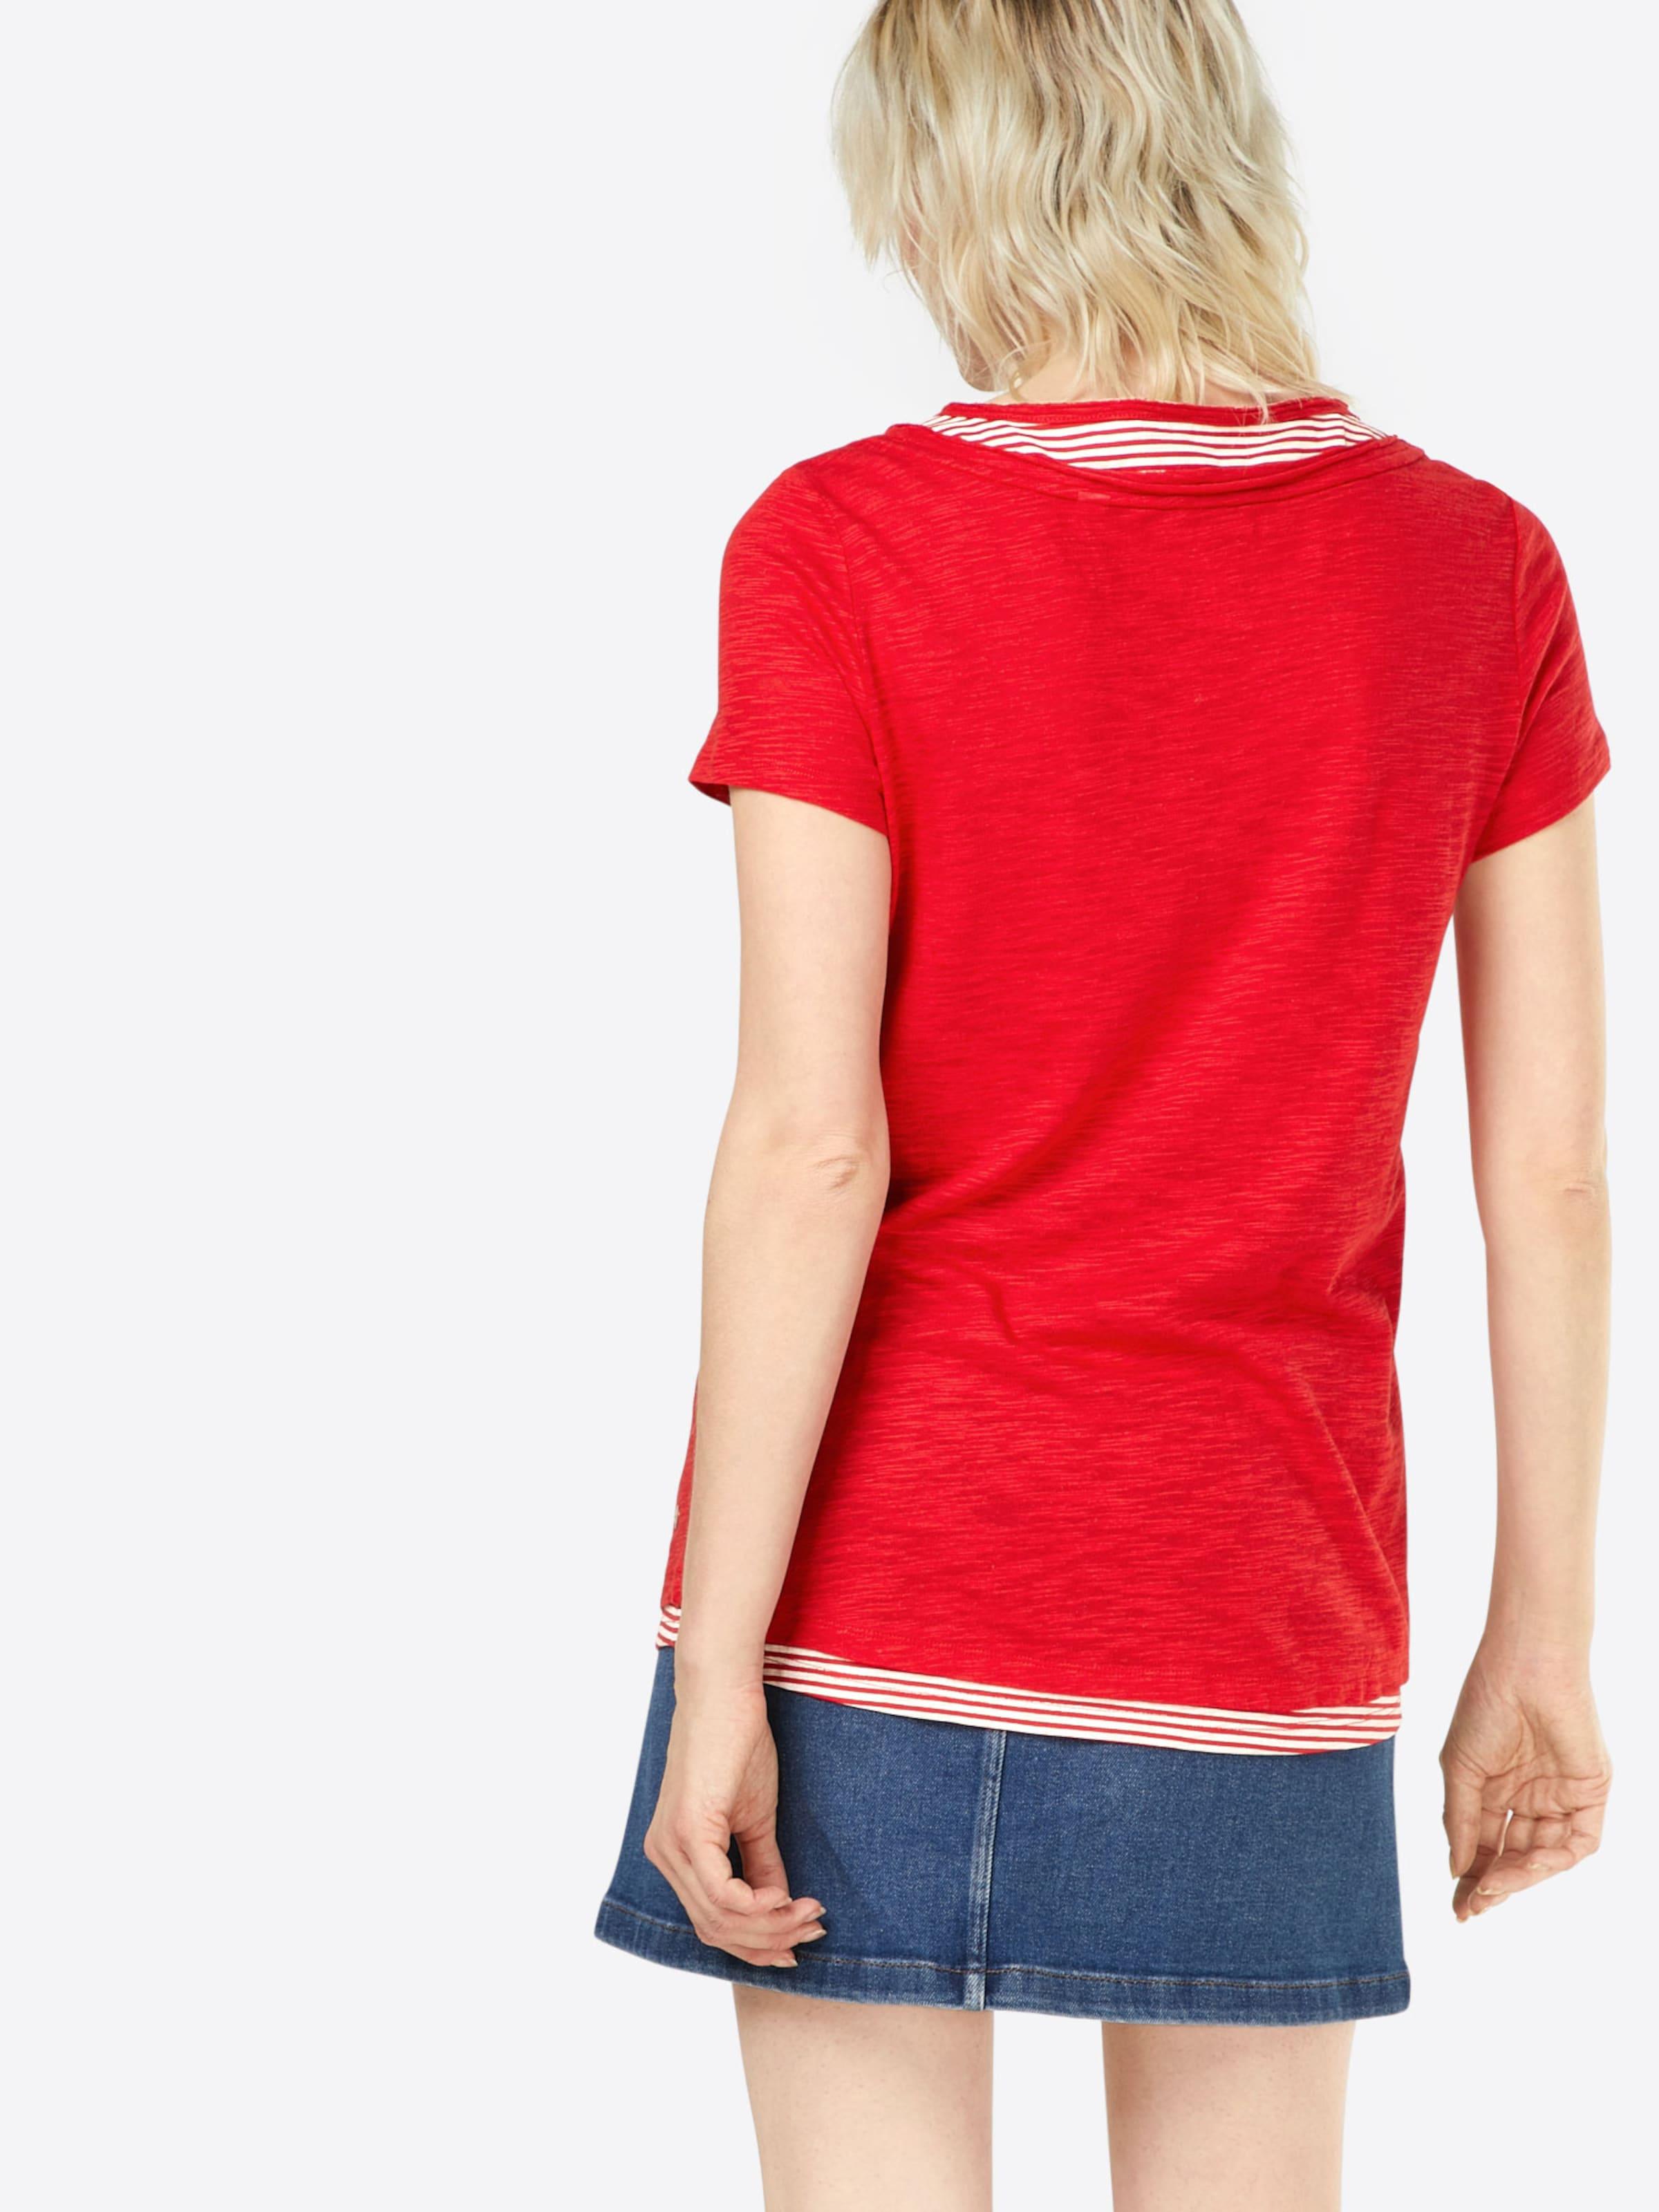 shirt Esprit Esprit T RougeBlanc T En dWexCrBo